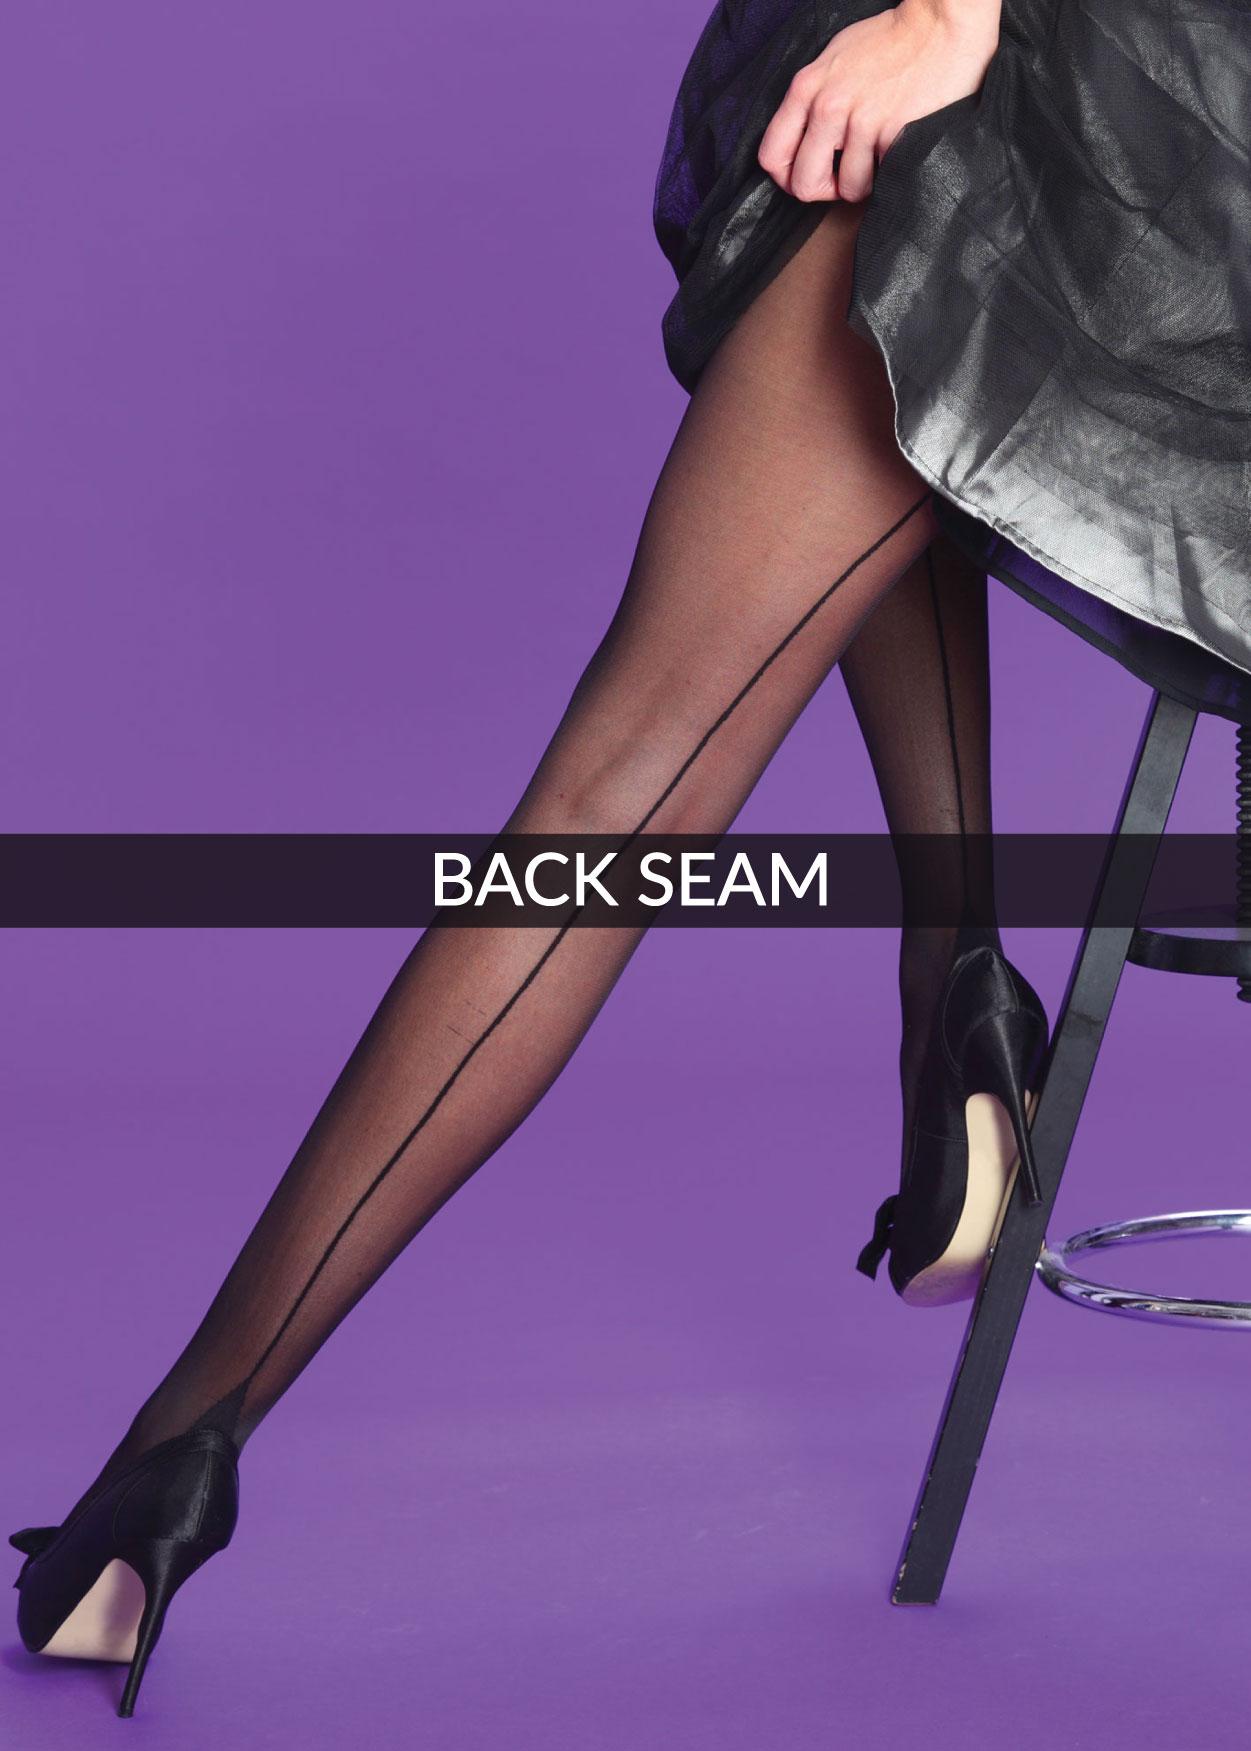 Back Seam